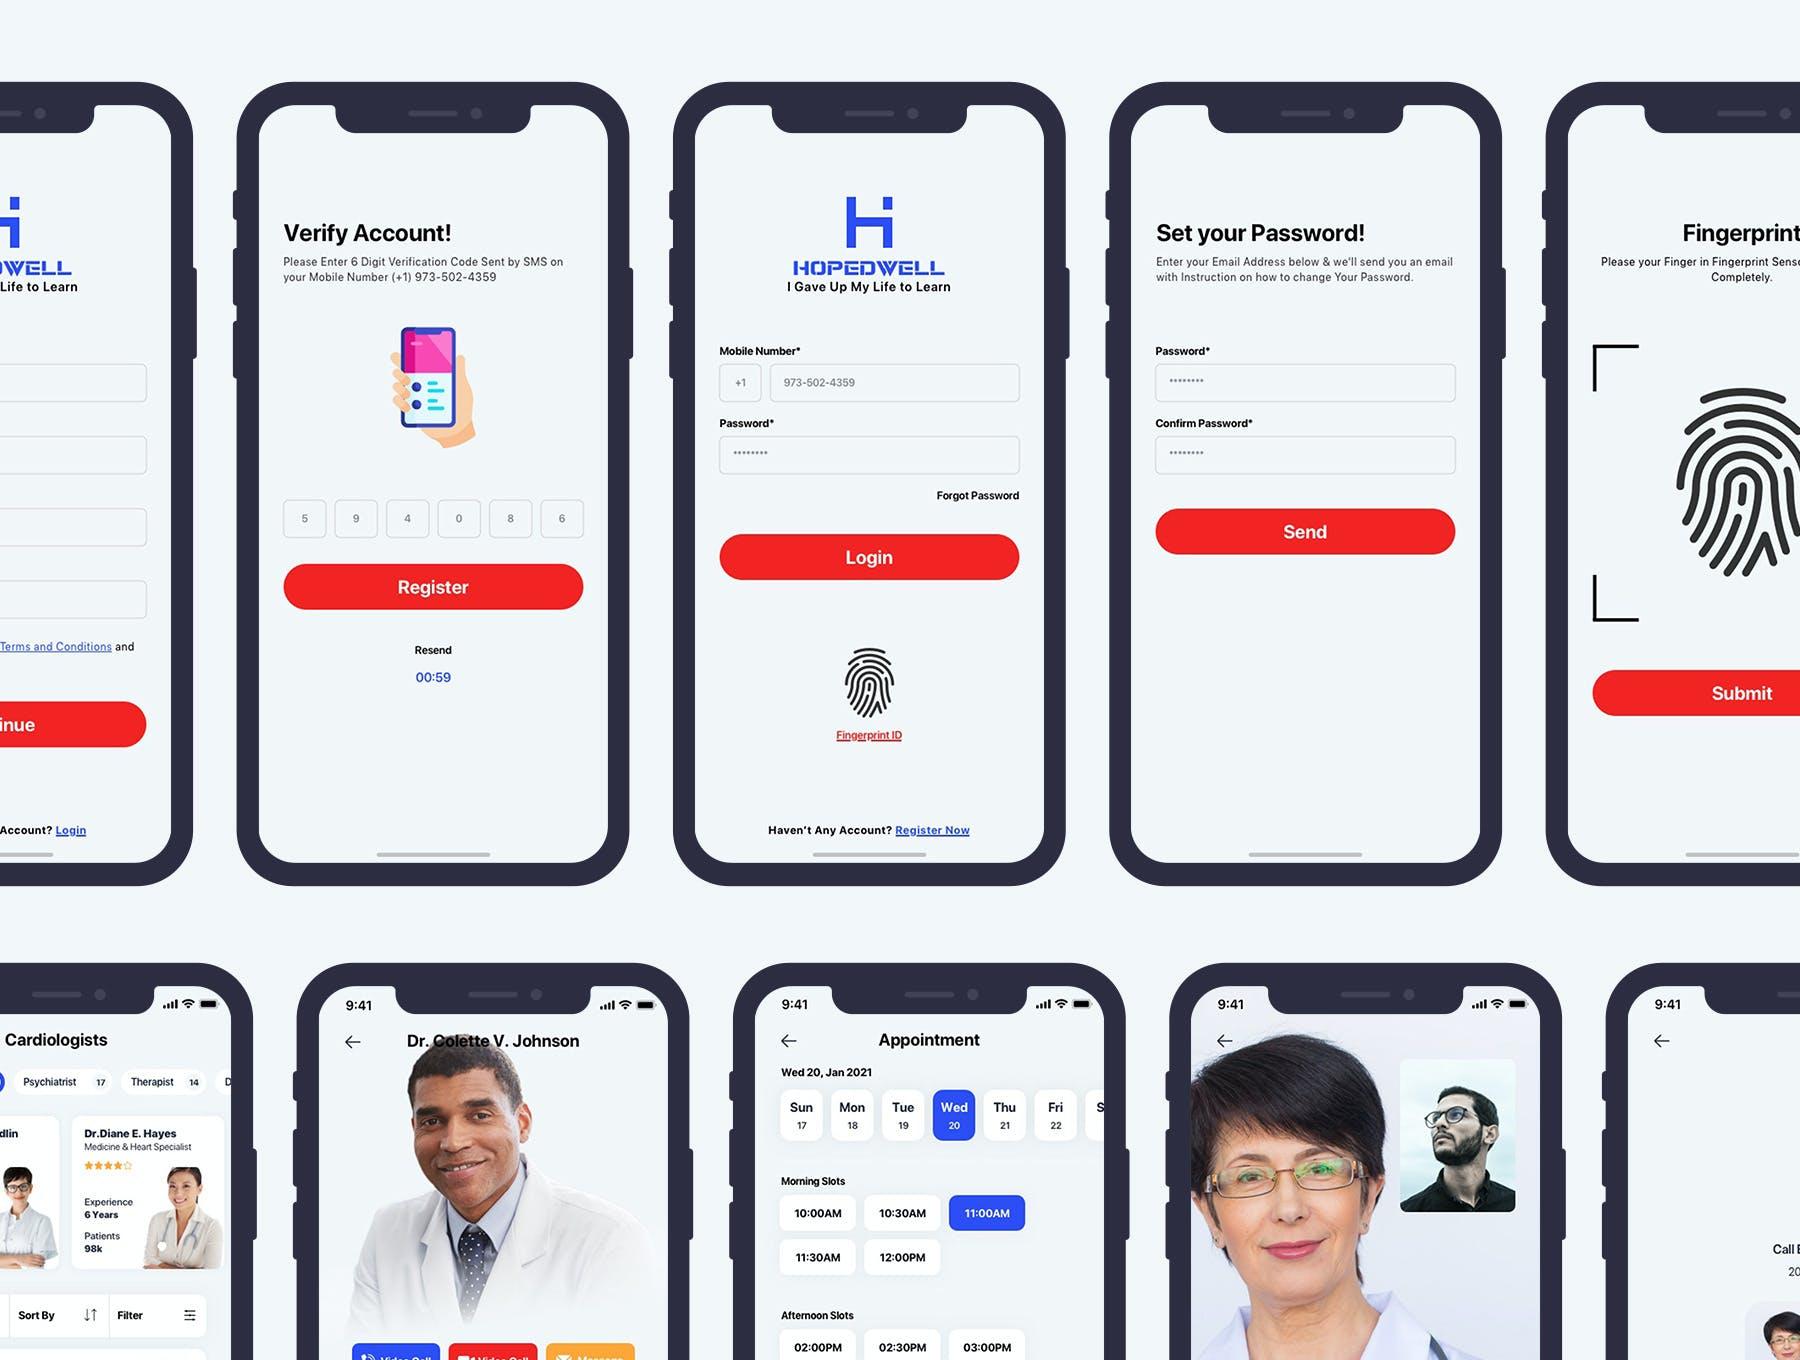 医院挂号卫生保健APP应用程序UI界面设计套件 Hospital & HealthCare Mobile App UI插图5